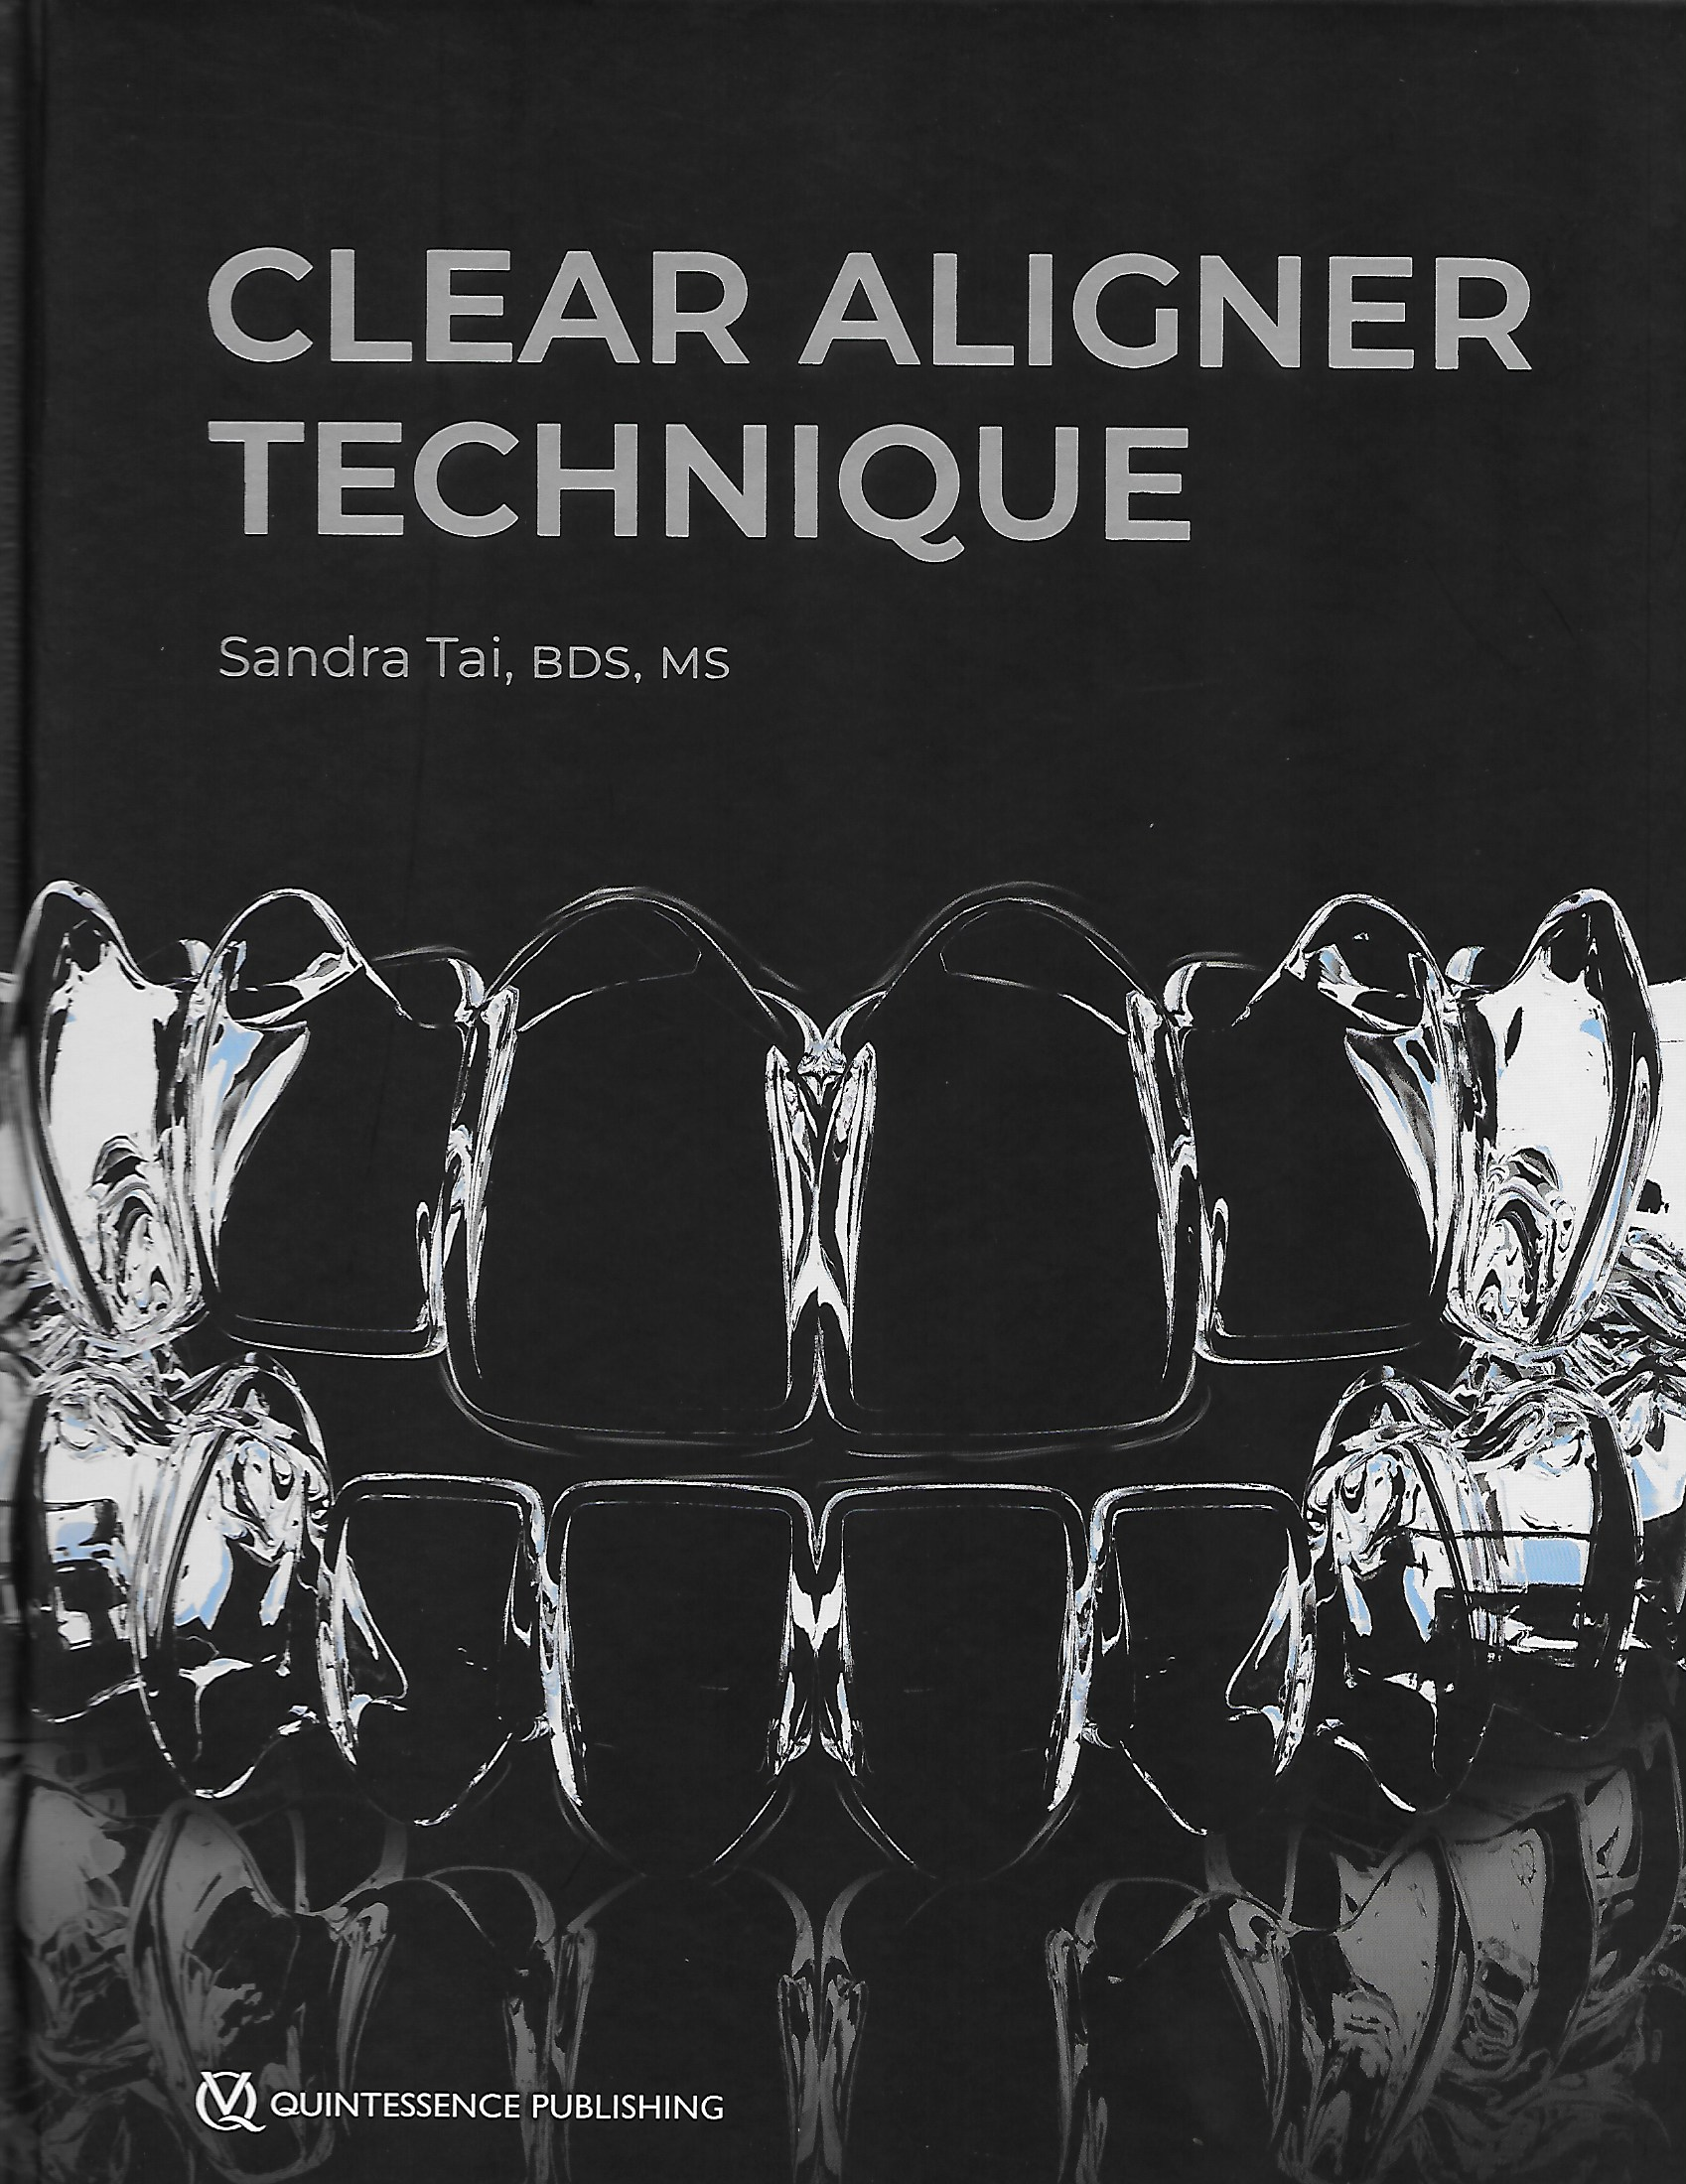 Clear Aligner Technique Book Cover - English